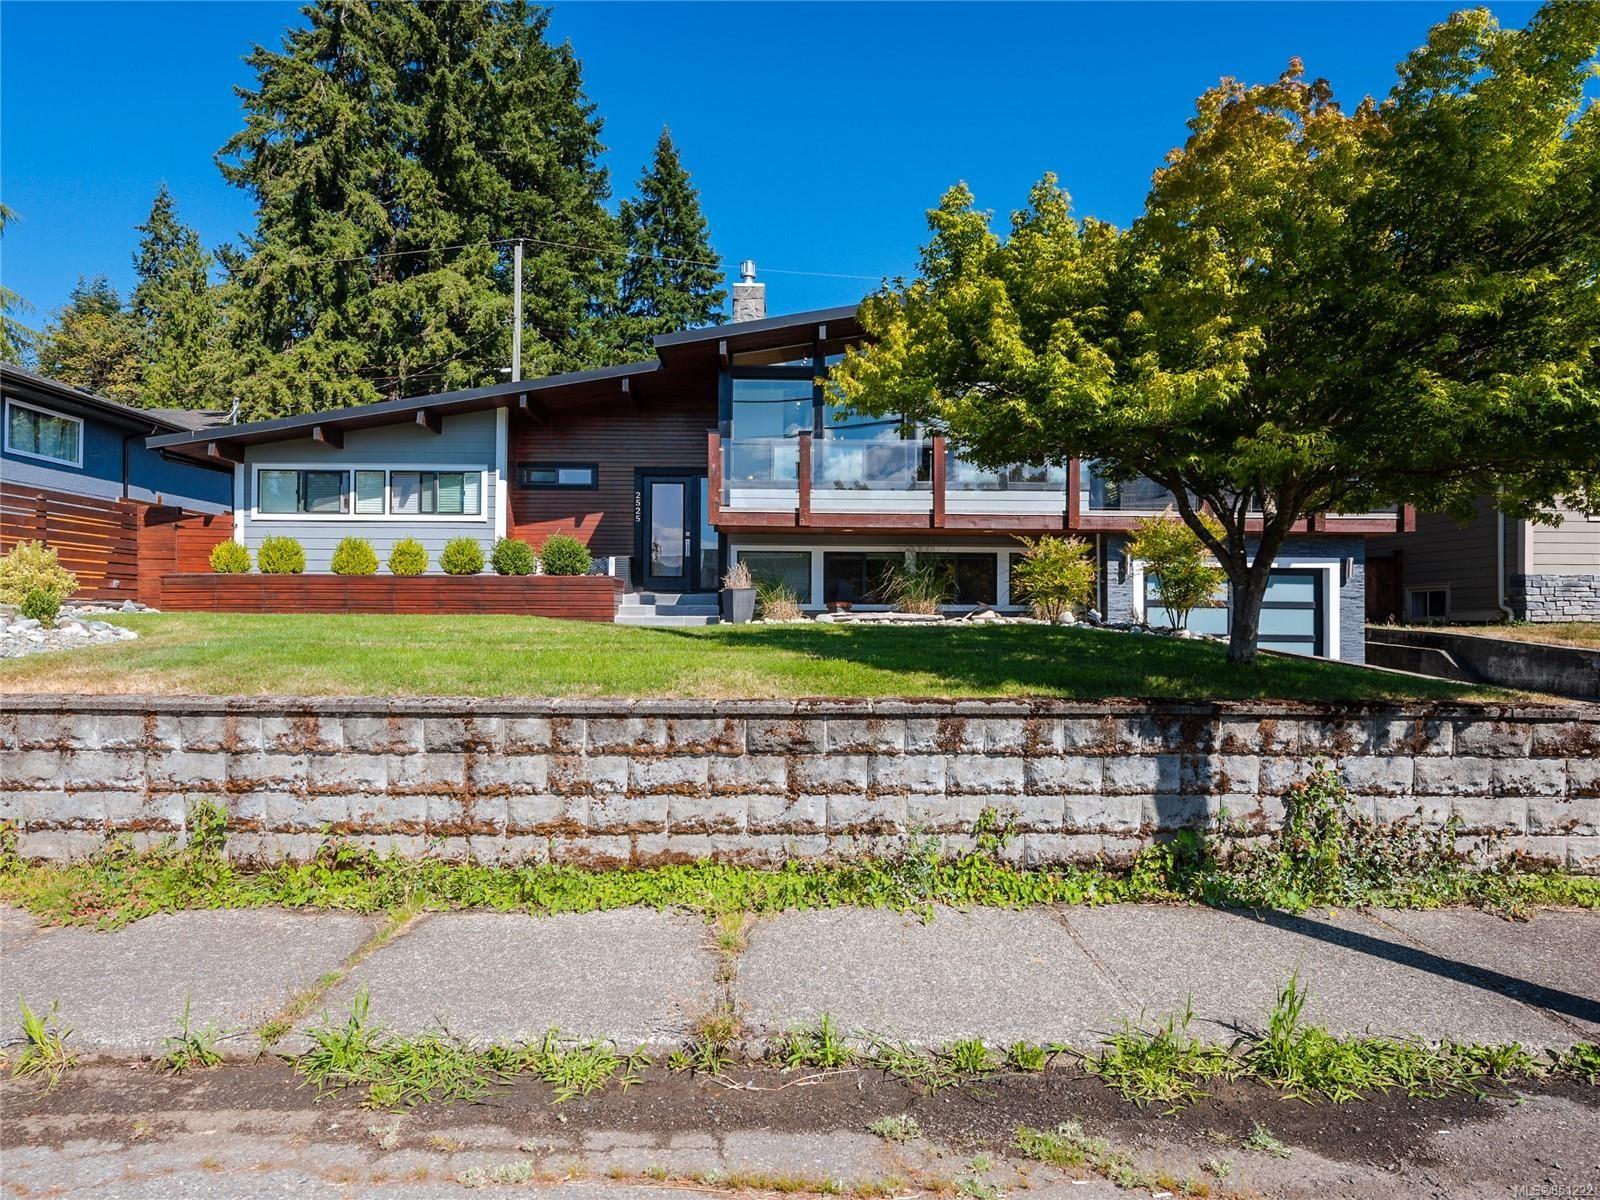 Photo 44: Photos: 2525 11th Ave in : PA Port Alberni House for sale (Port Alberni)  : MLS®# 851222